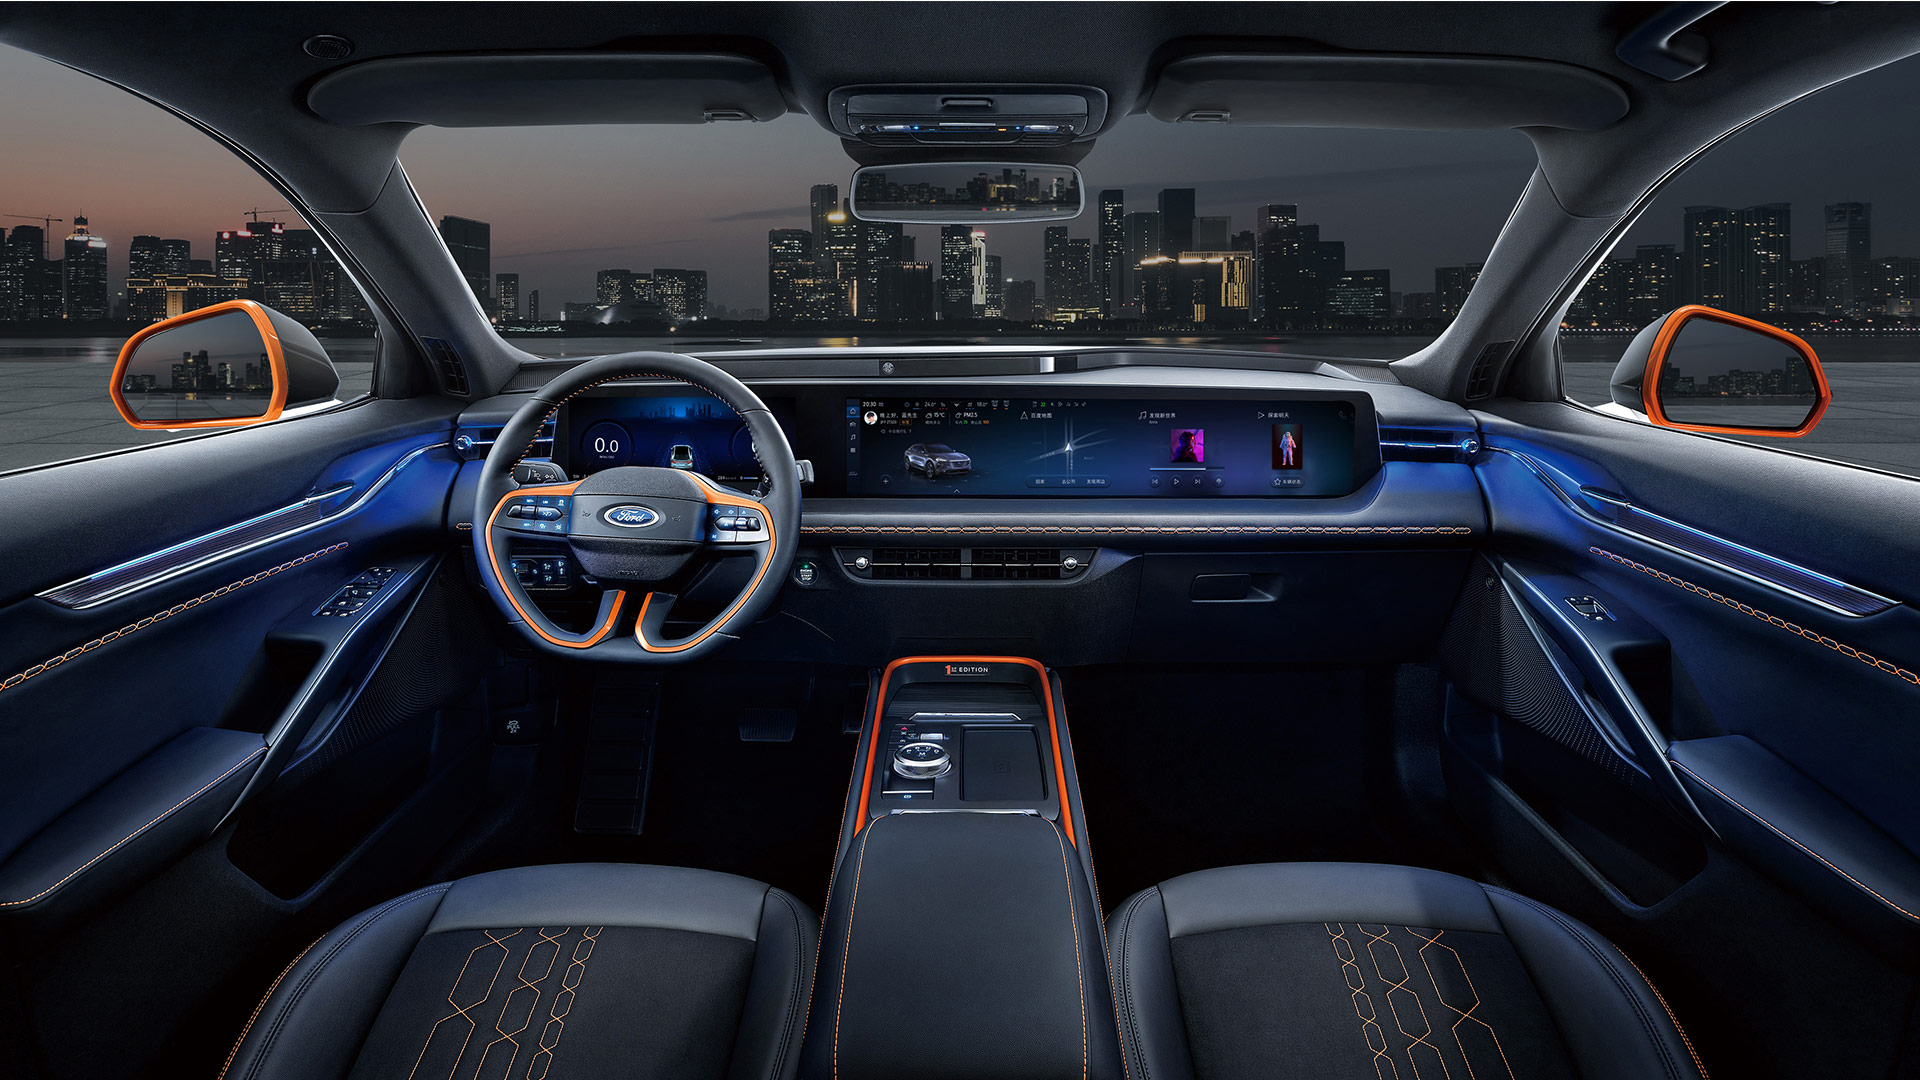 The Ford Evos Dashboard